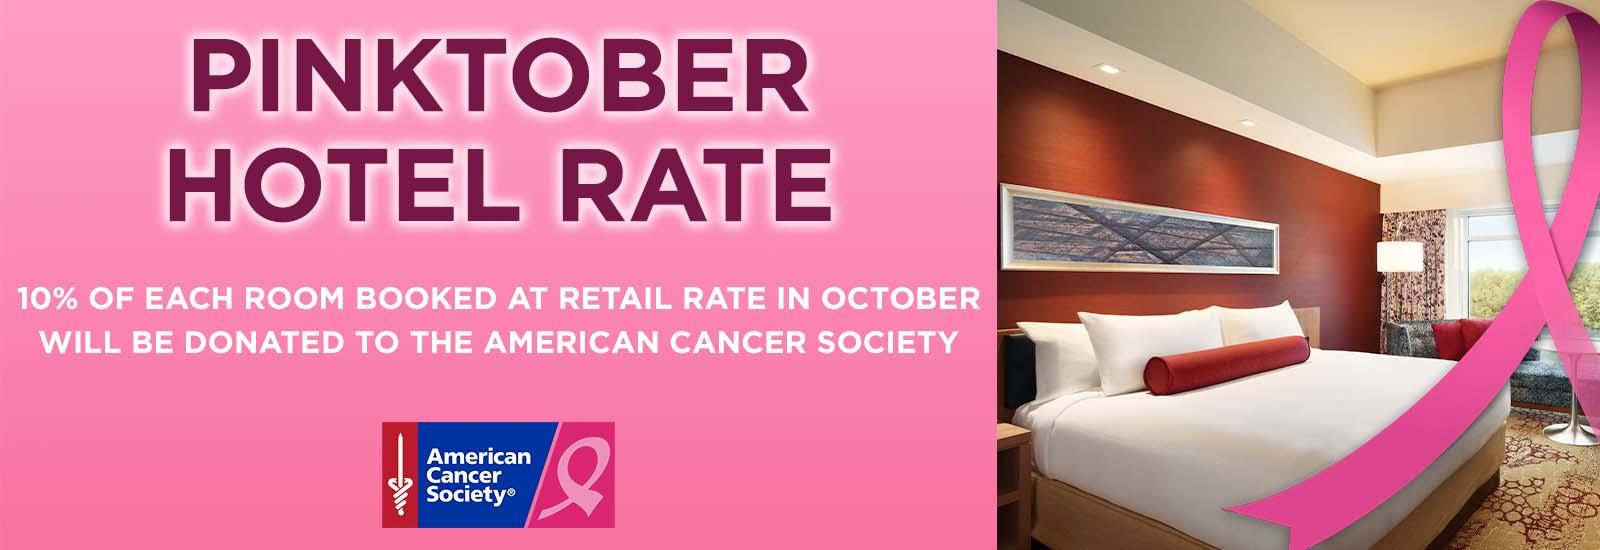 Pinktober Hotel Rate